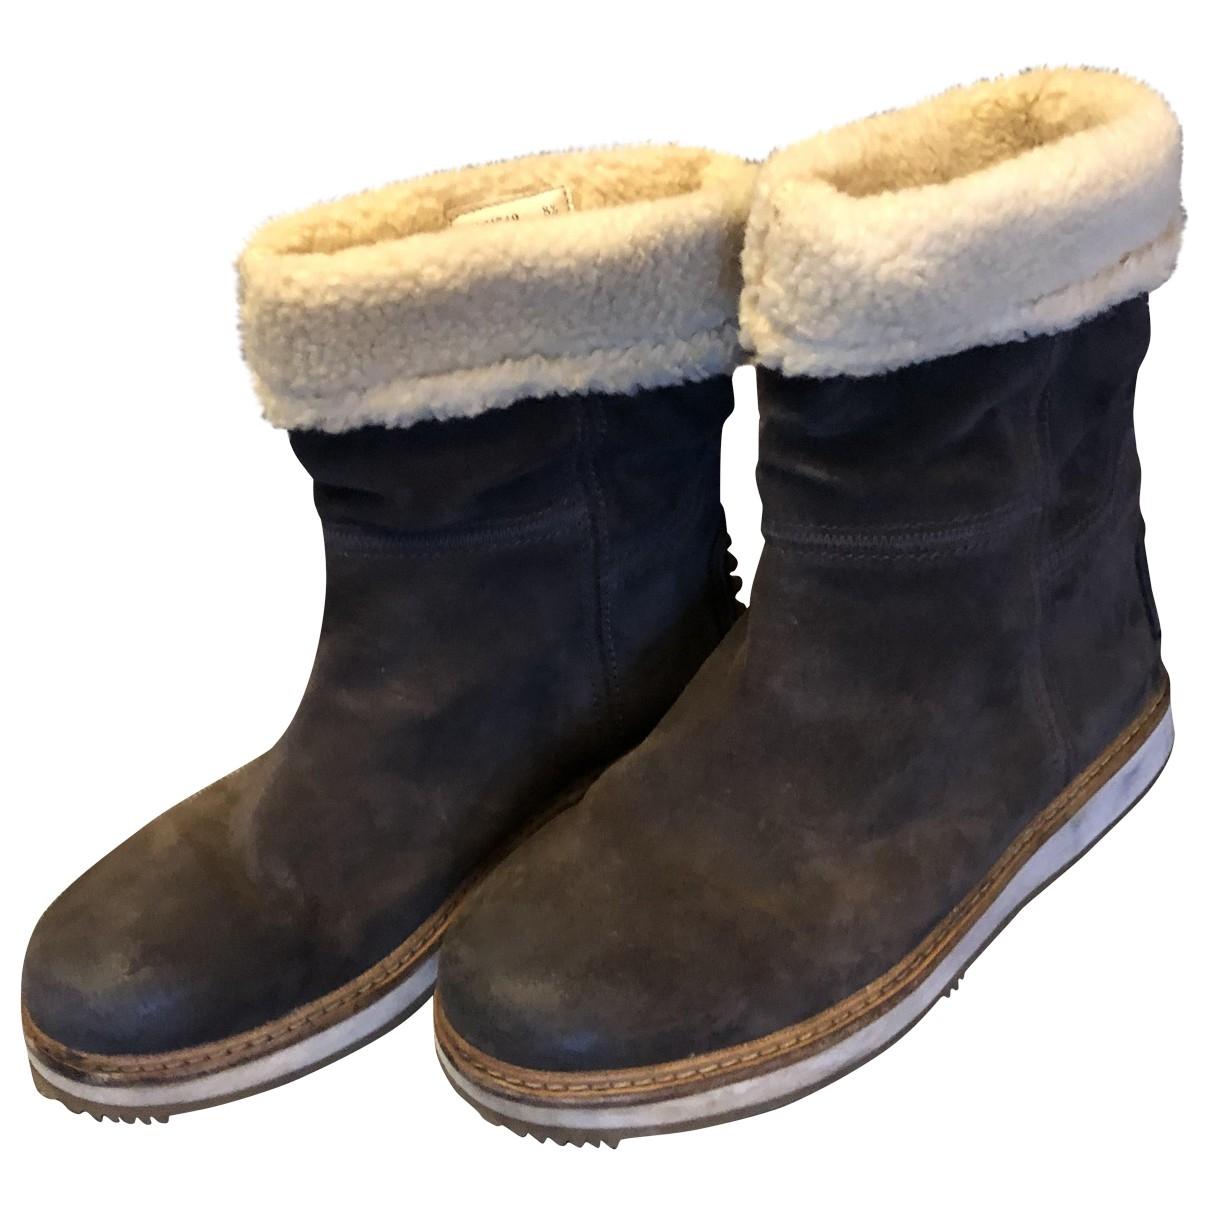 Carshoe \N Beige Suede Boots for Men 42.5 EU